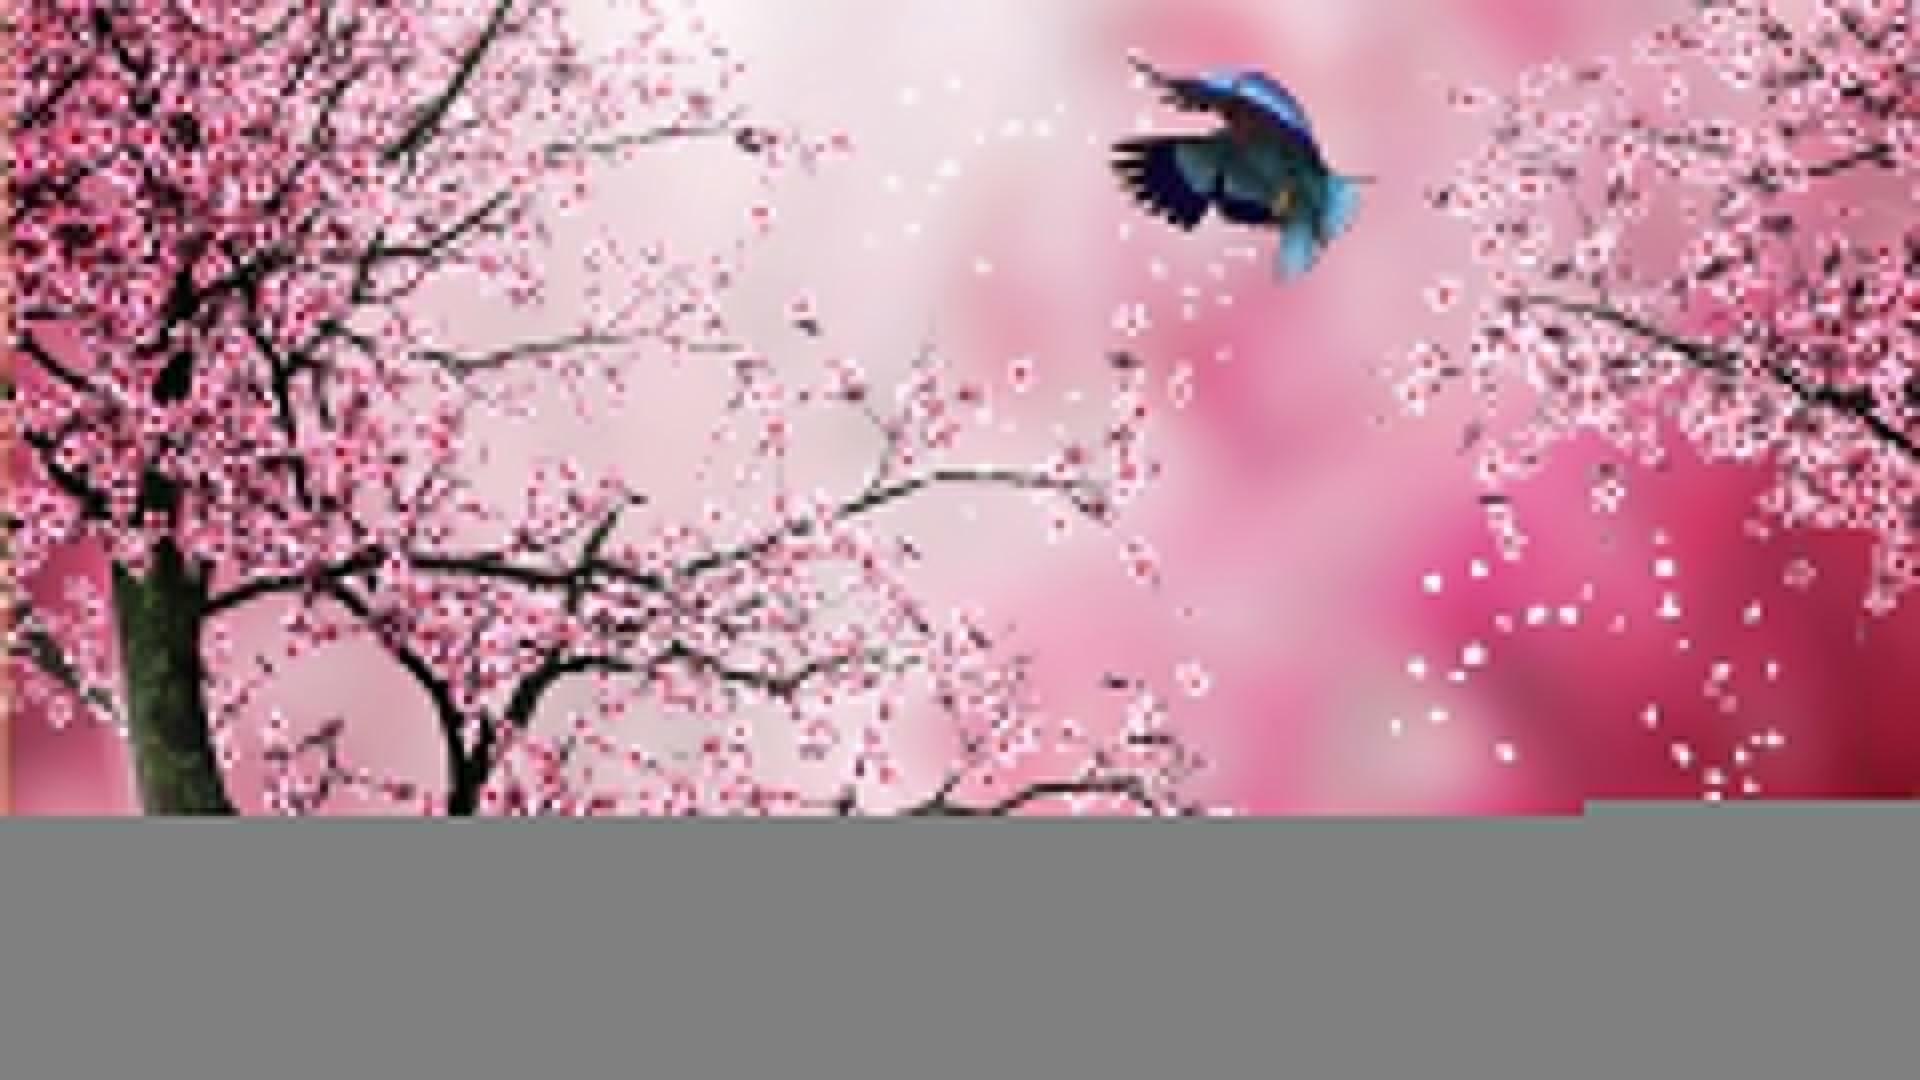 11673) Cherry Blossom Tree Desktop HD Wallpaper – WalOps.com